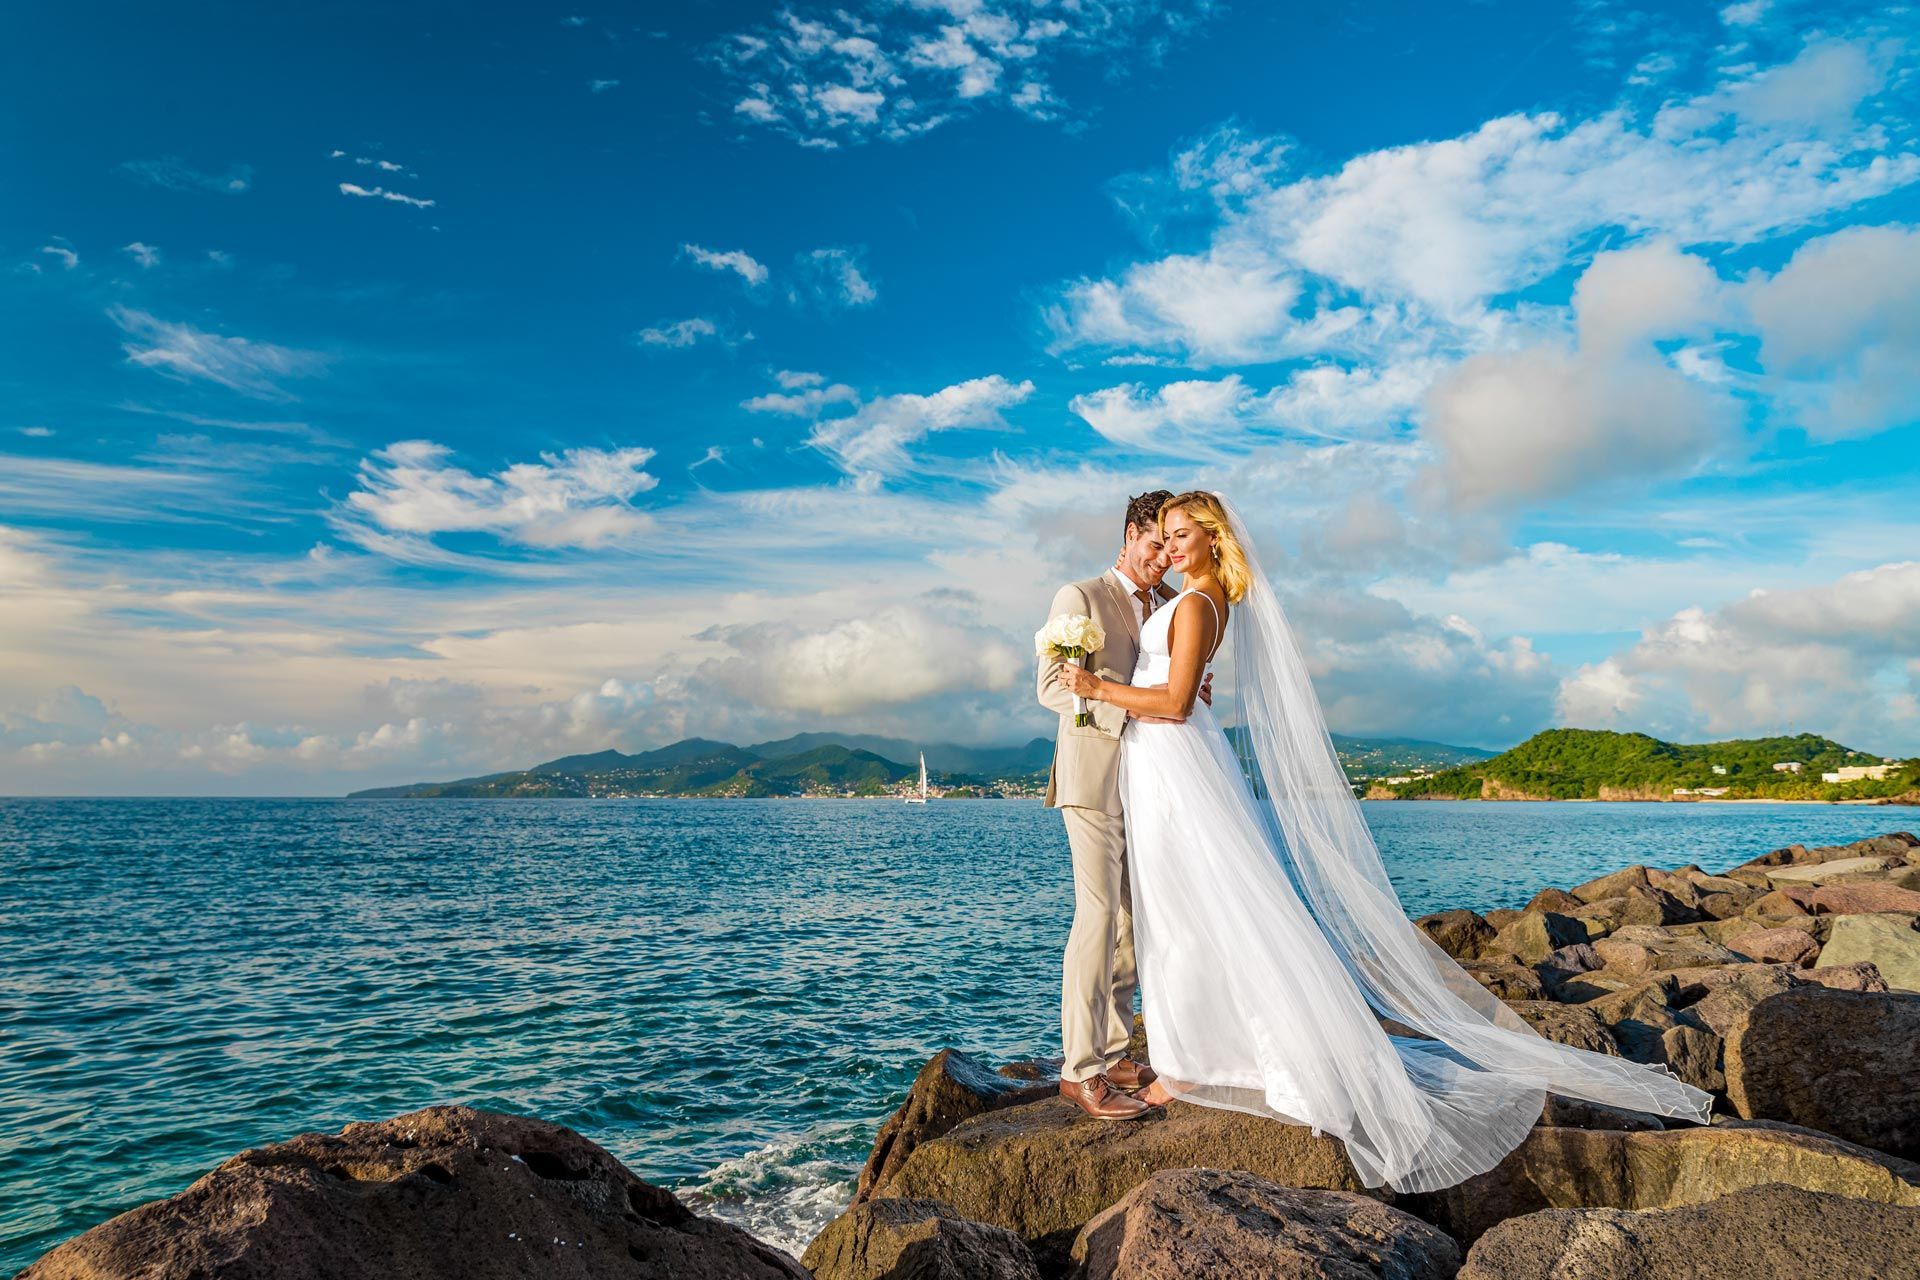 Sandals Grenada Couple Wedding Rocks